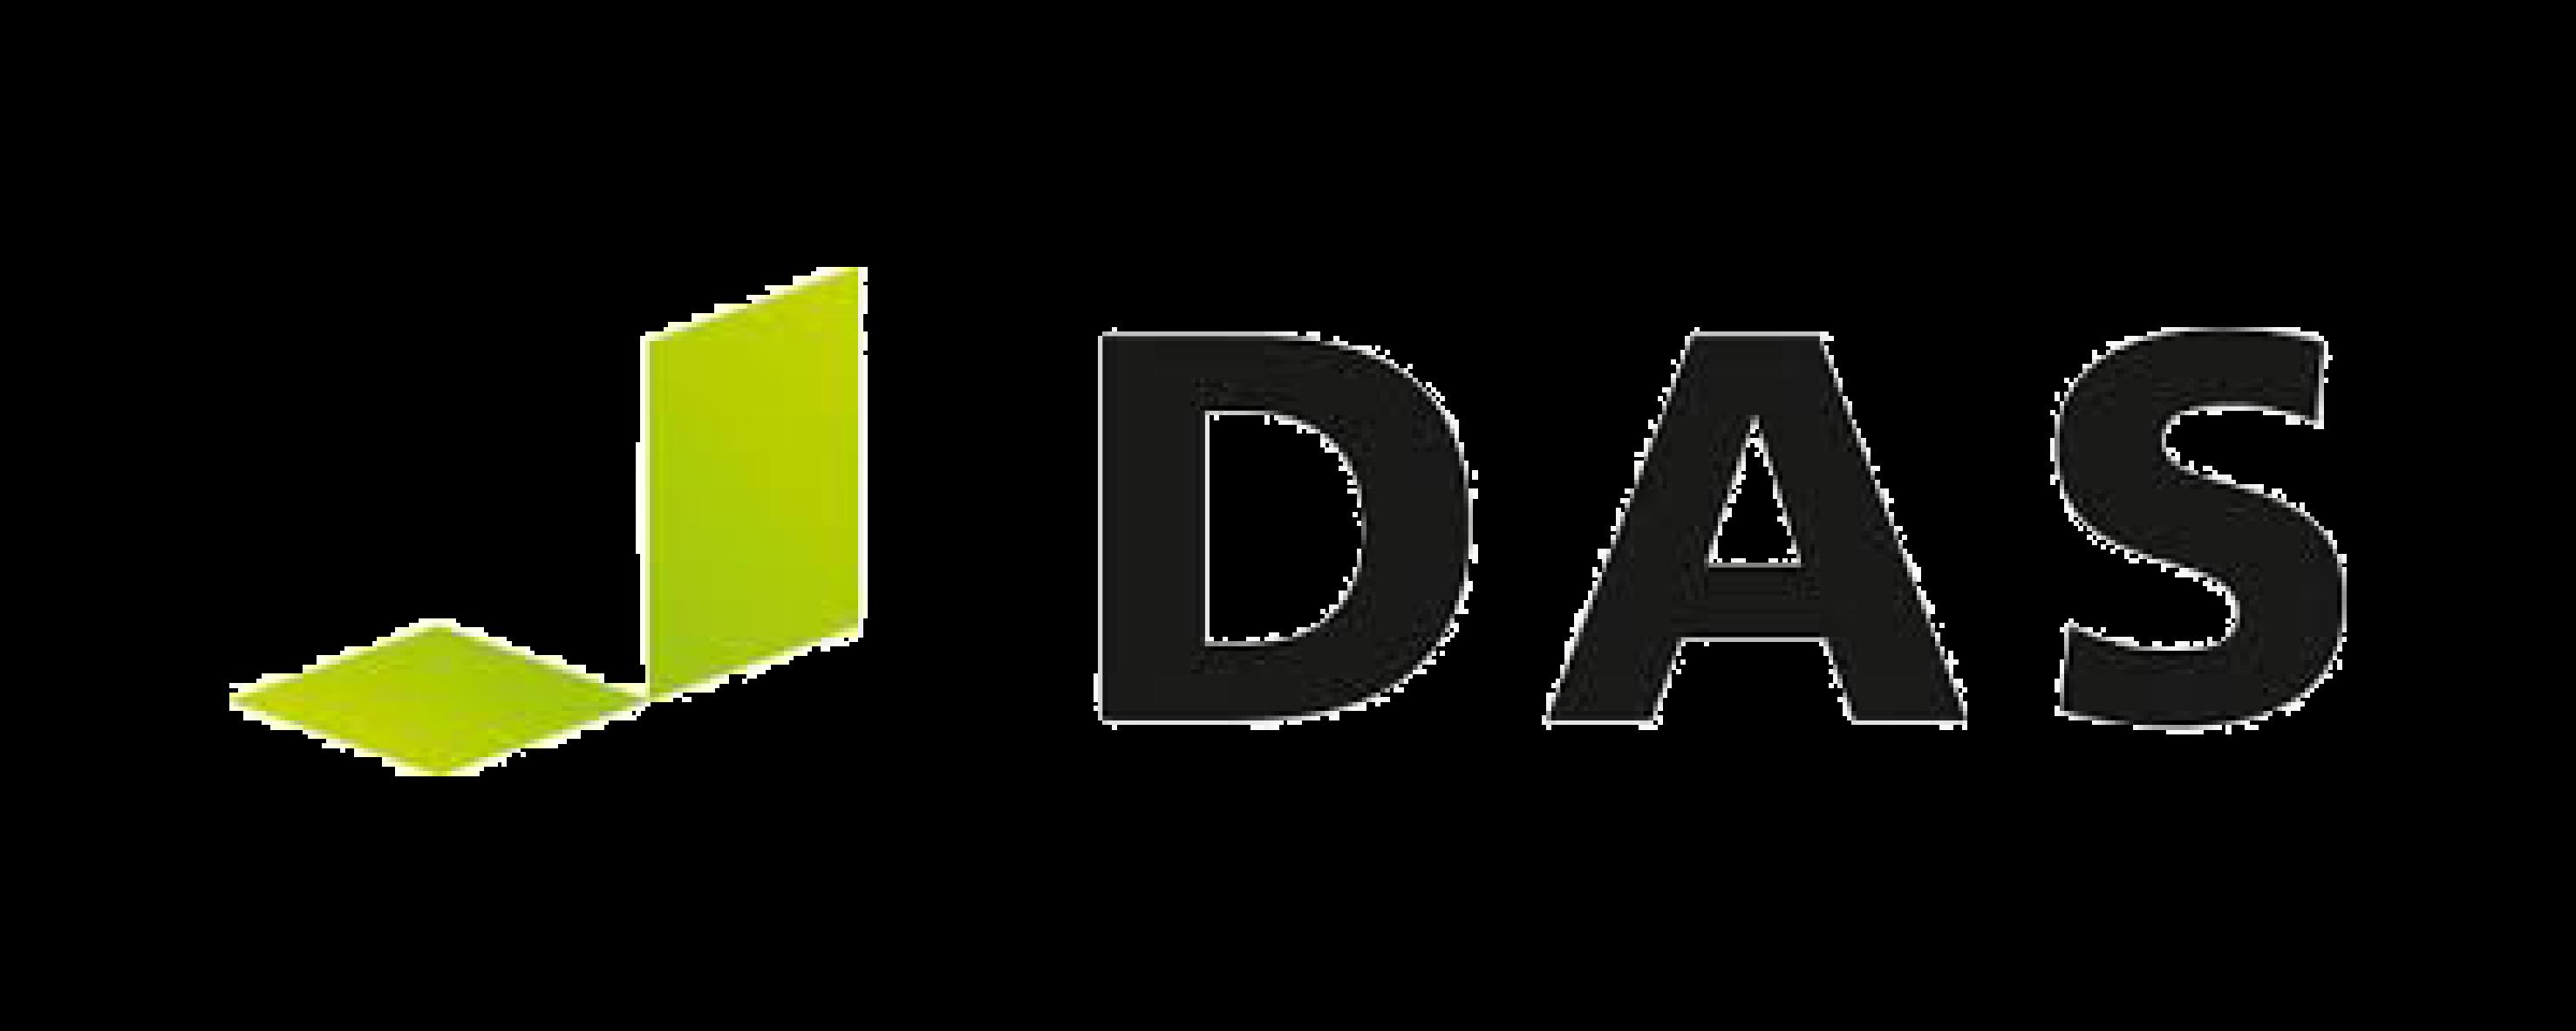 das-getjenny-logo-20